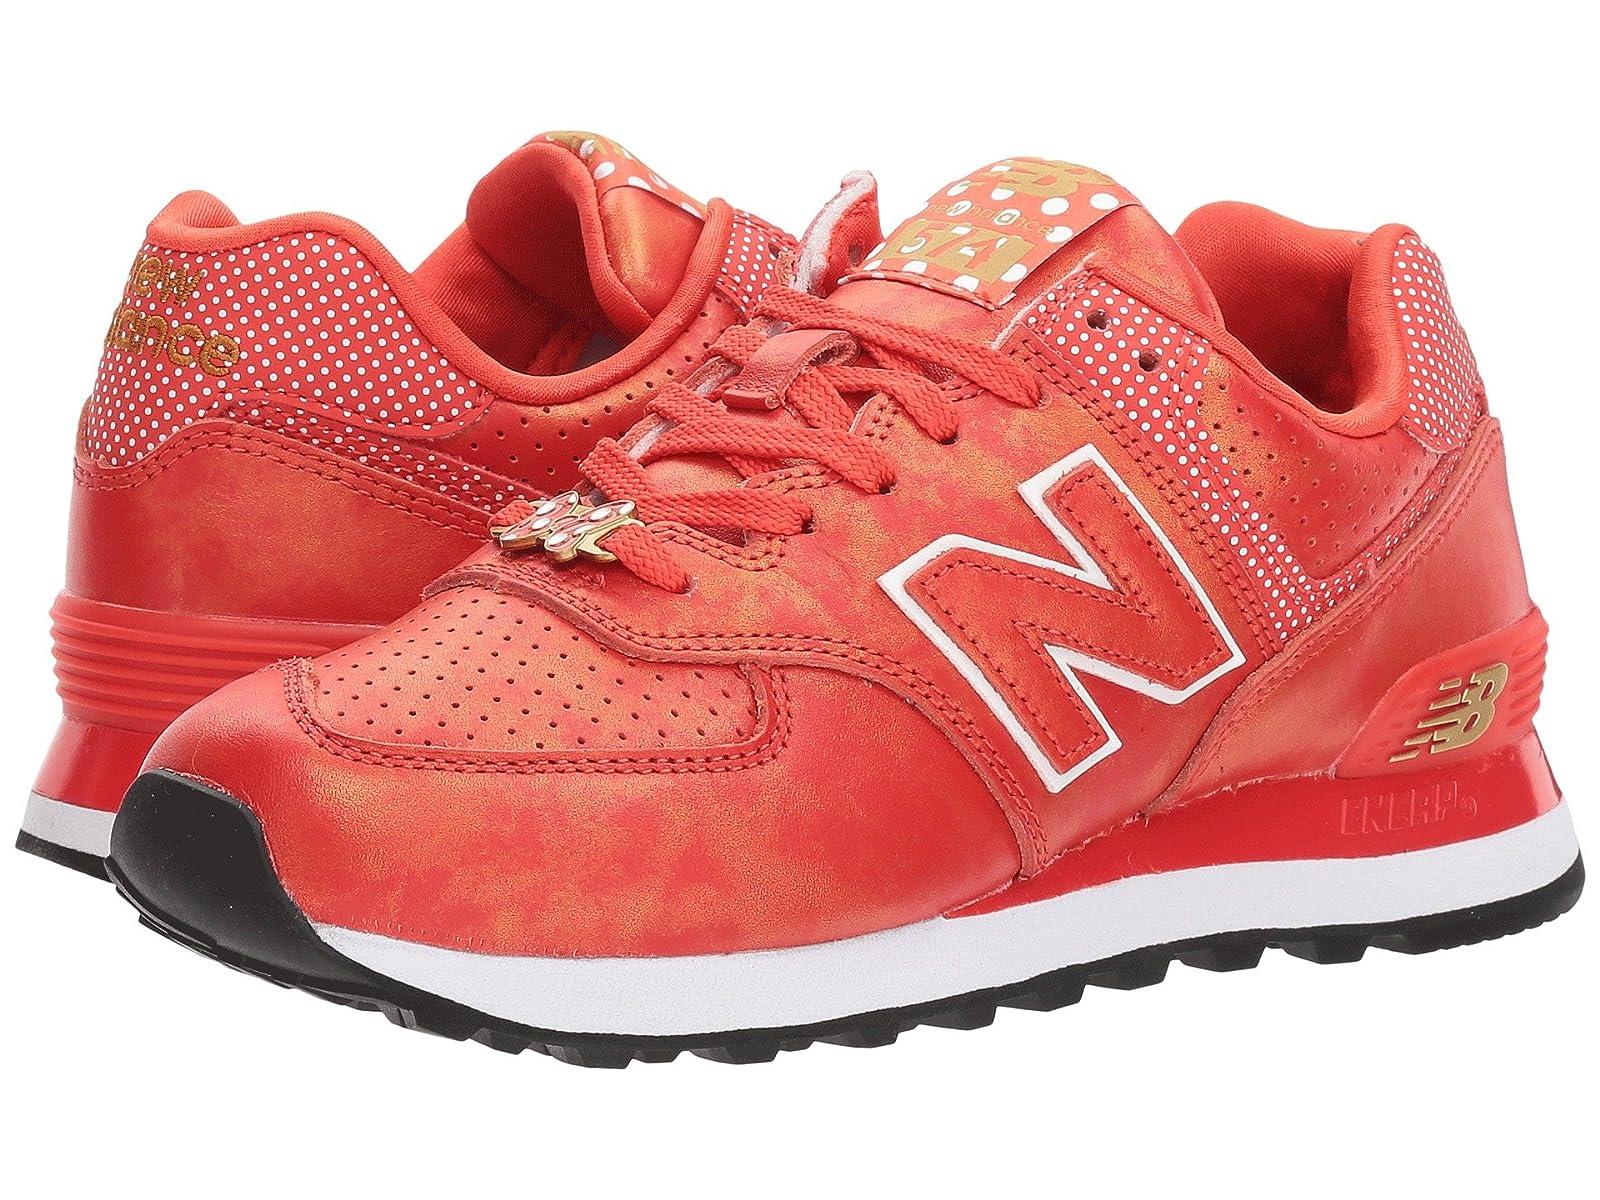 New Balance Classics Minnie Rocks the Dots WL574v2Cheap and distinctive eye-catching shoes